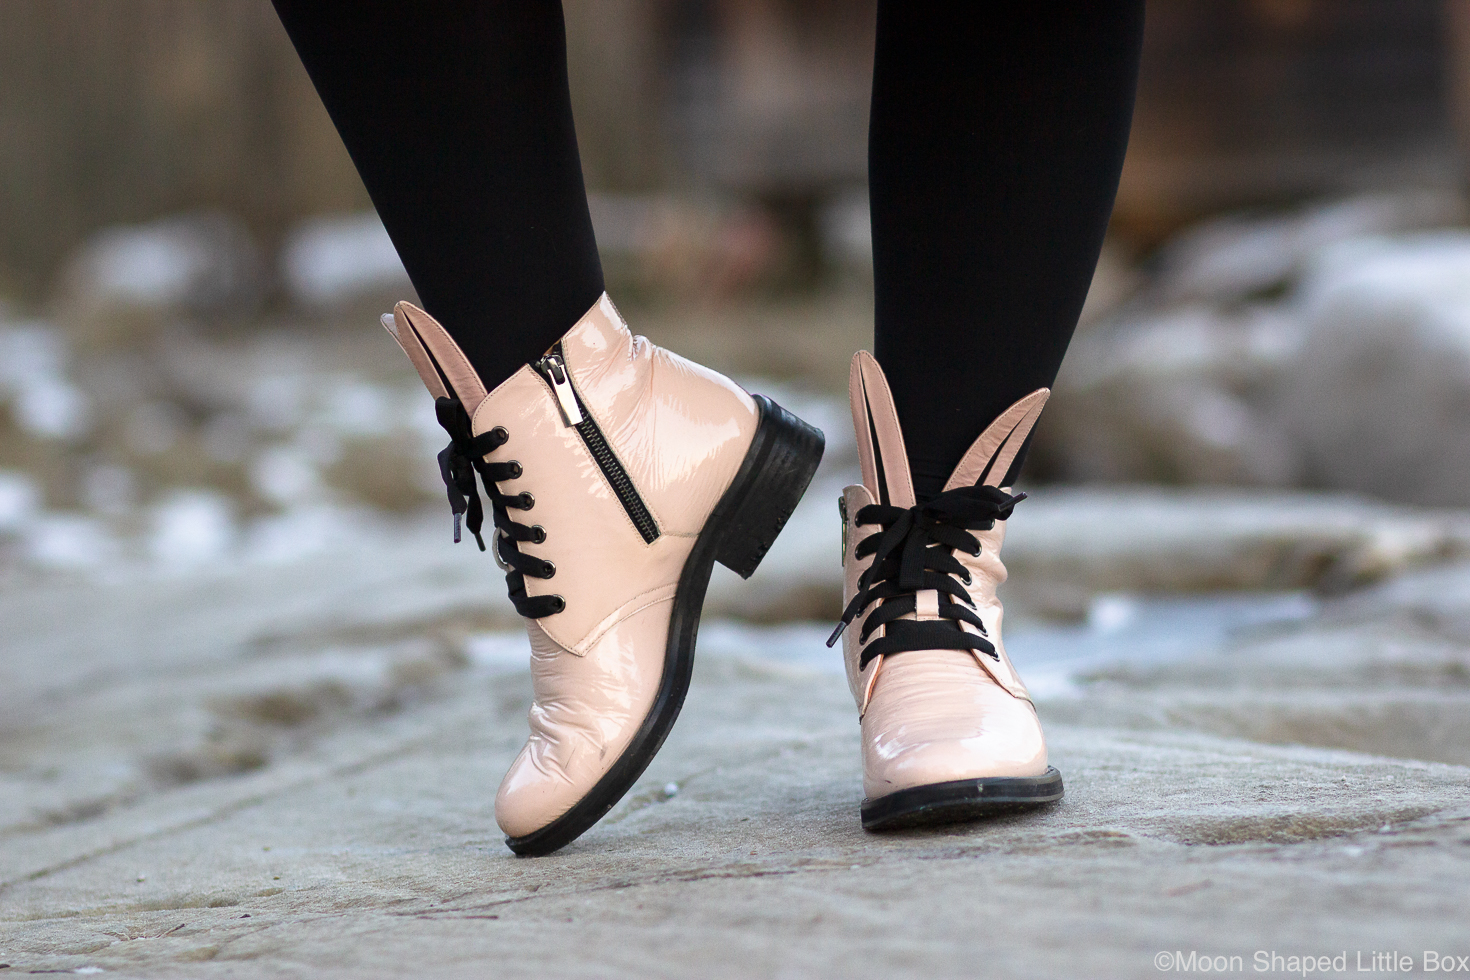 Minna-Parikka-Bunny-Boots-Powder-8